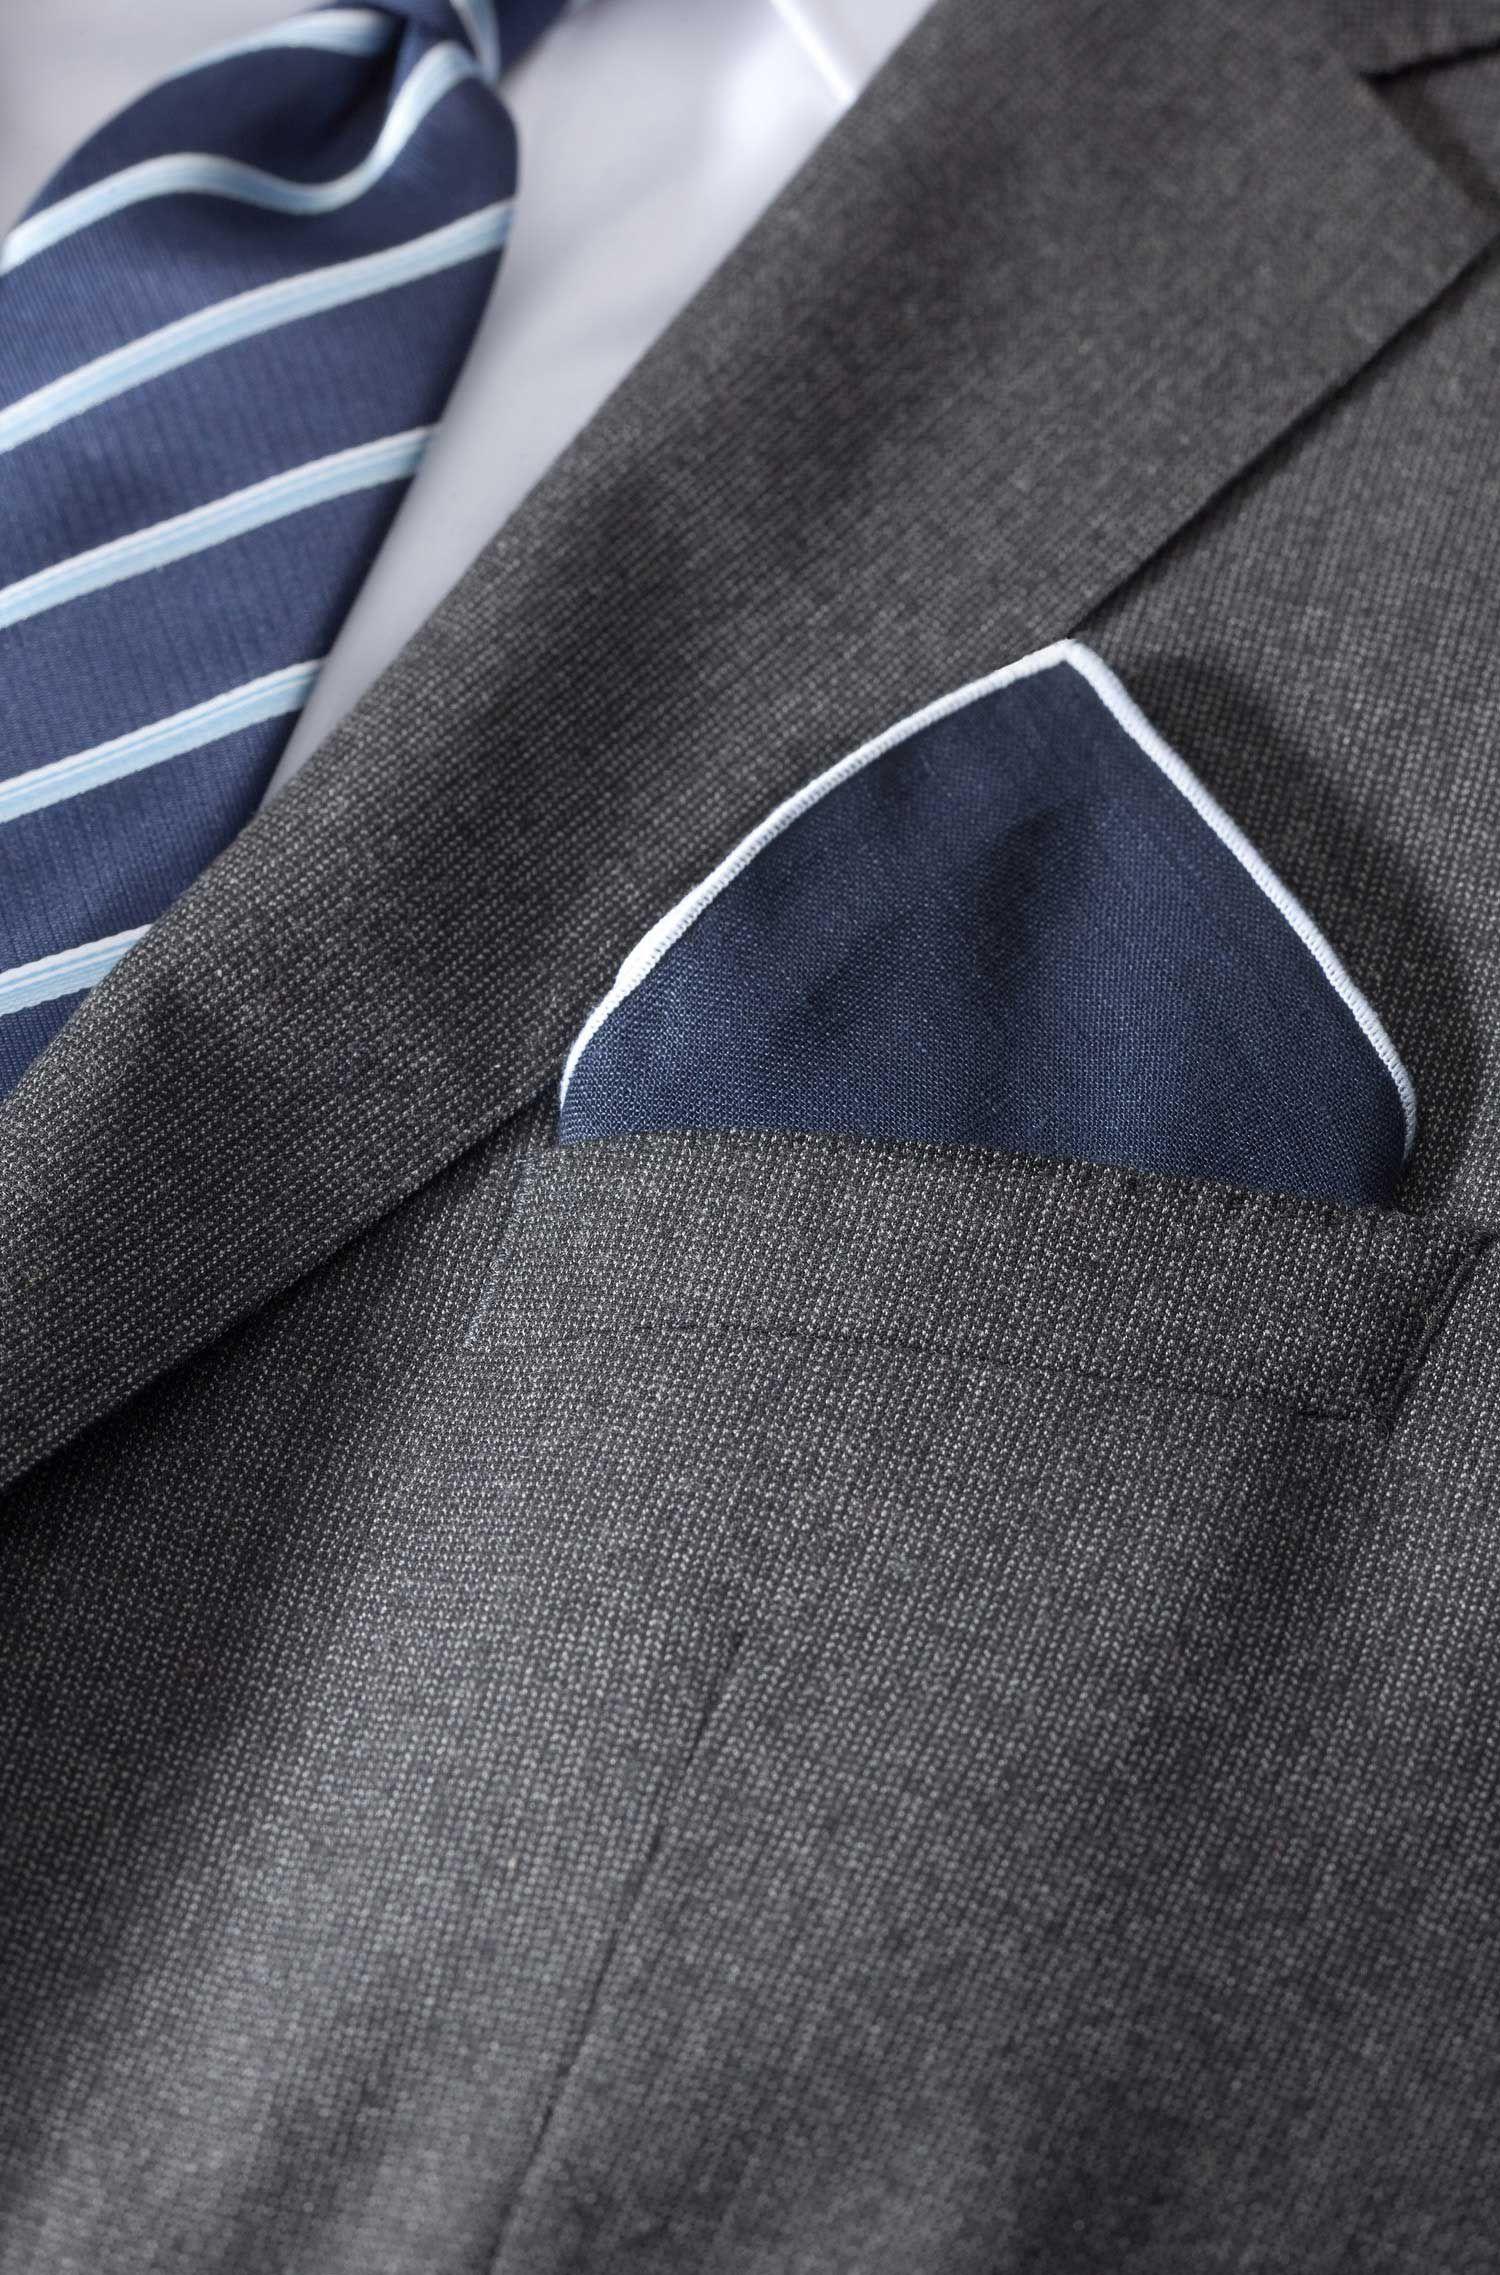 Pochette en lin, Pocket square 33x33